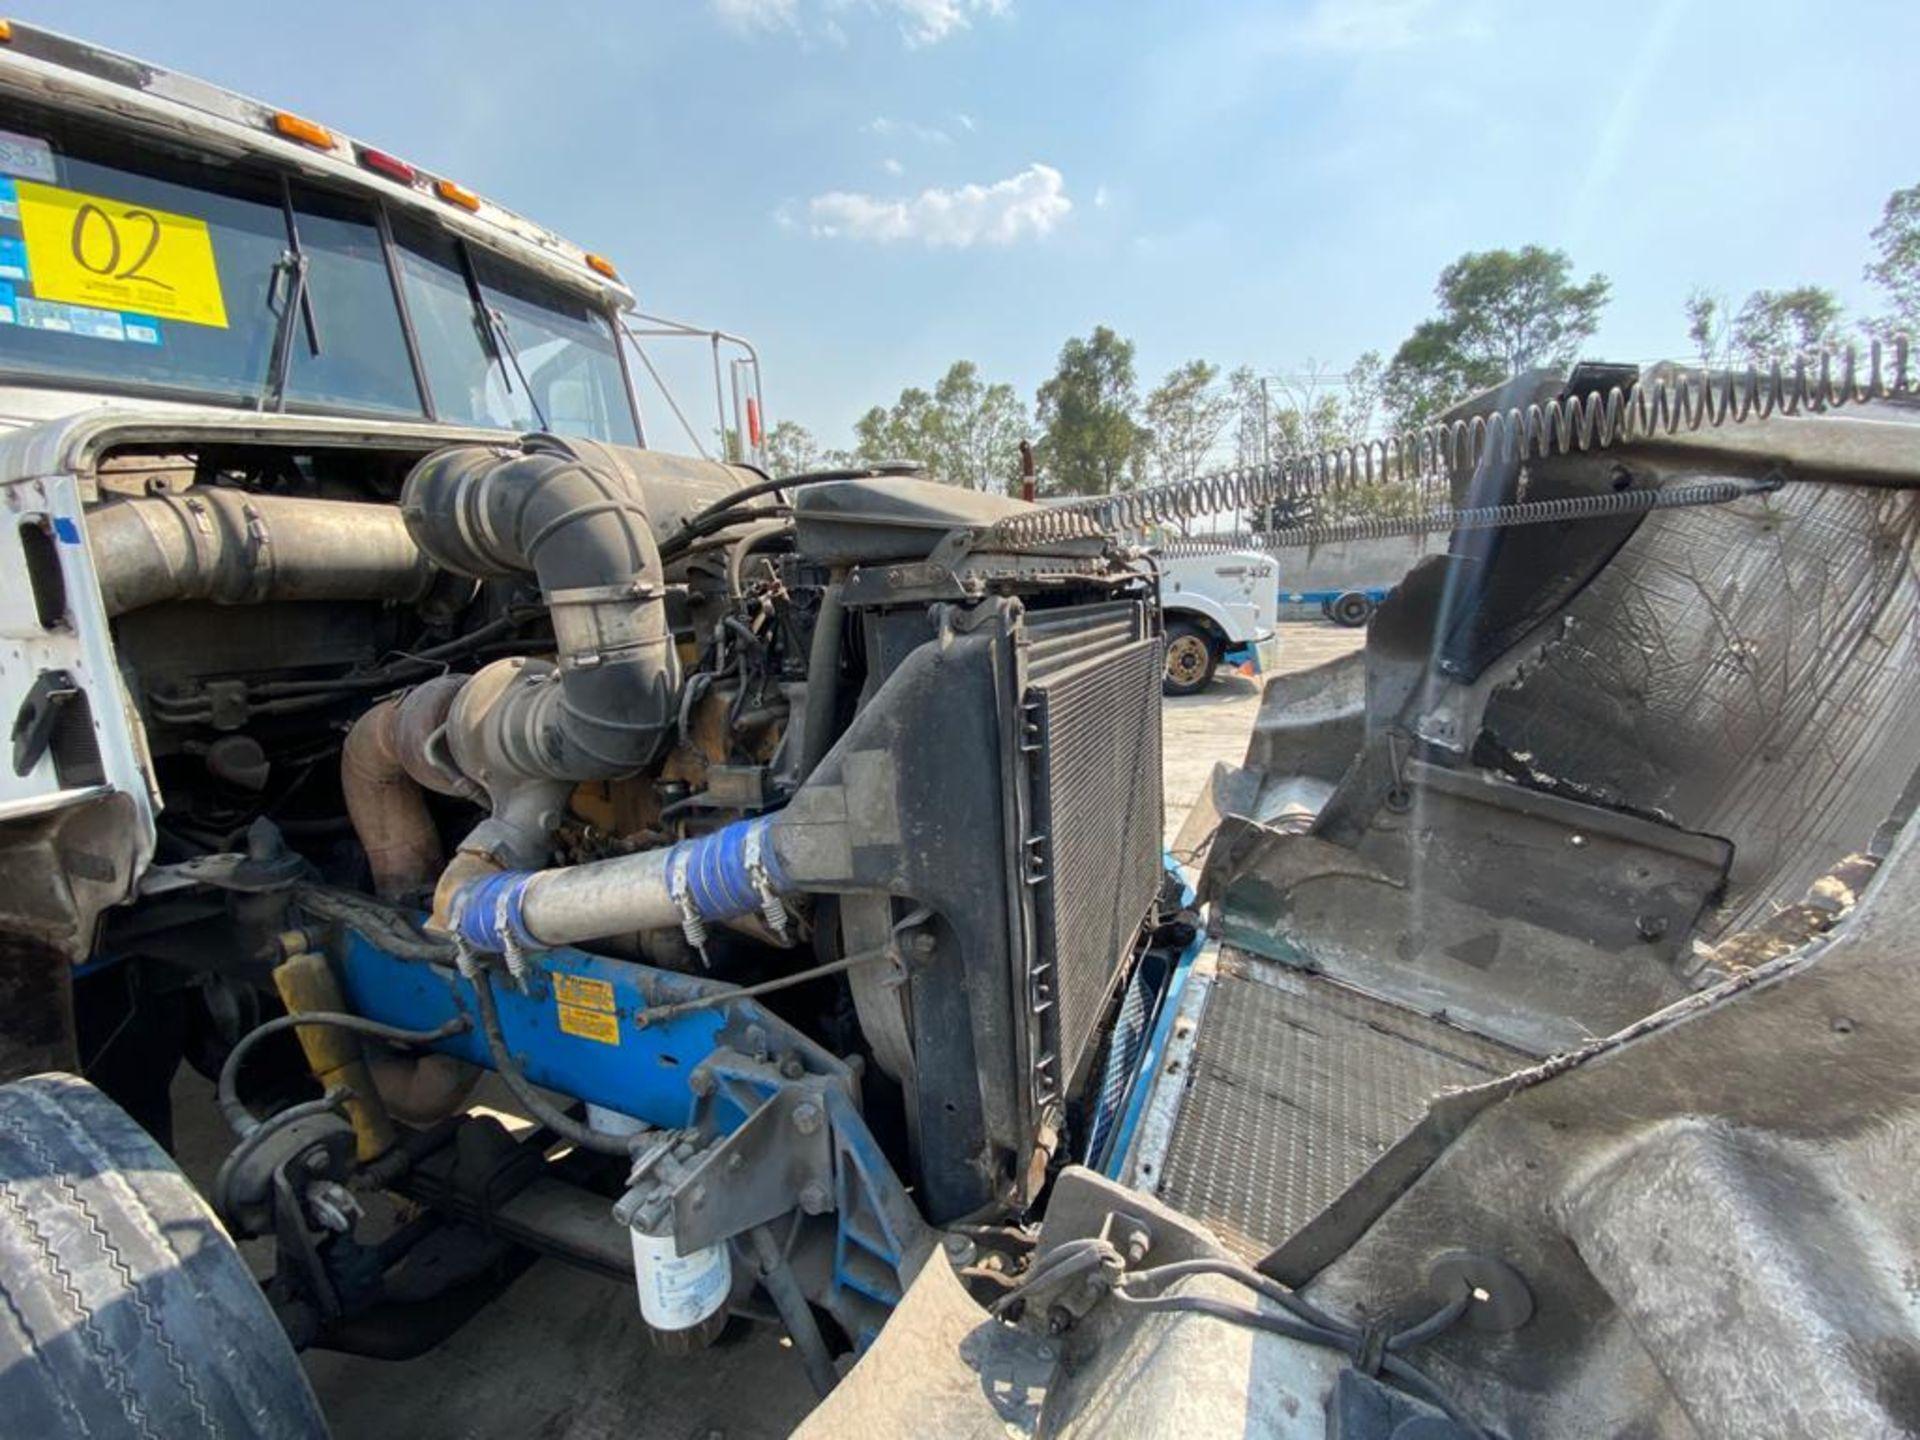 1999 Kenworth Sleeper truck tractor, standard transmission of 18 speeds - Image 58 of 75